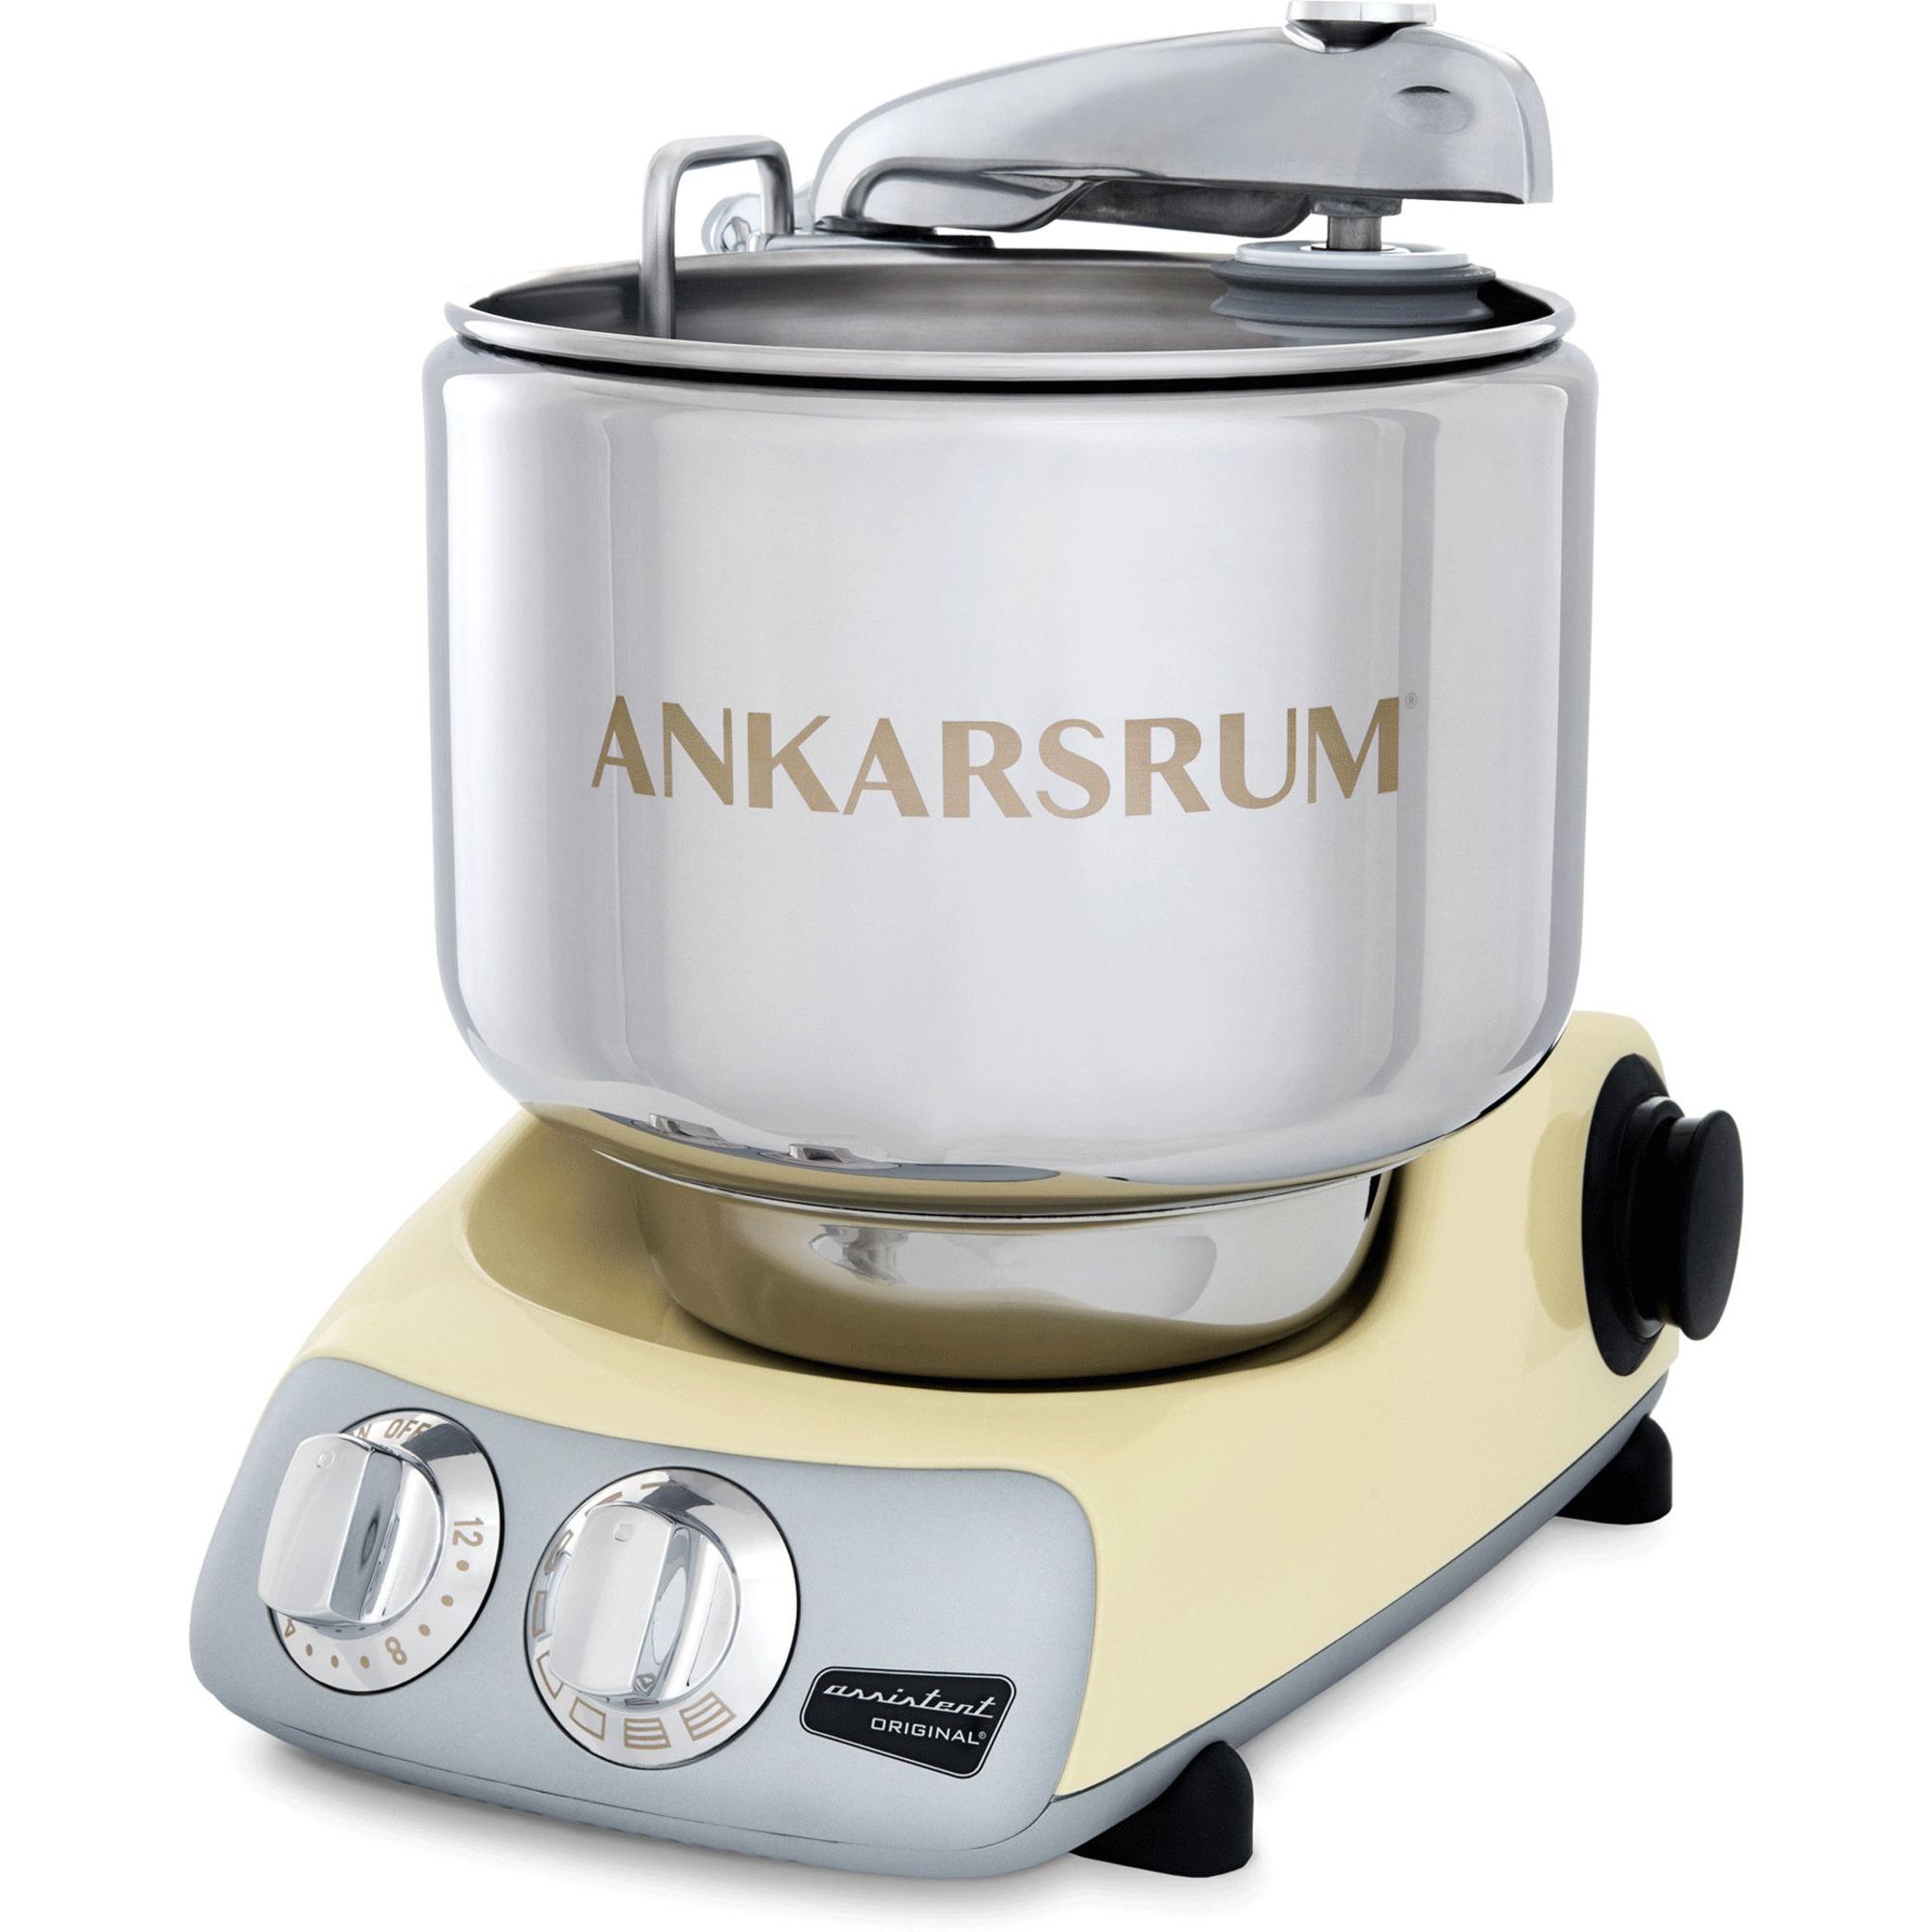 Ankarsrum NY Assistent Original Creme AKM 6230 C